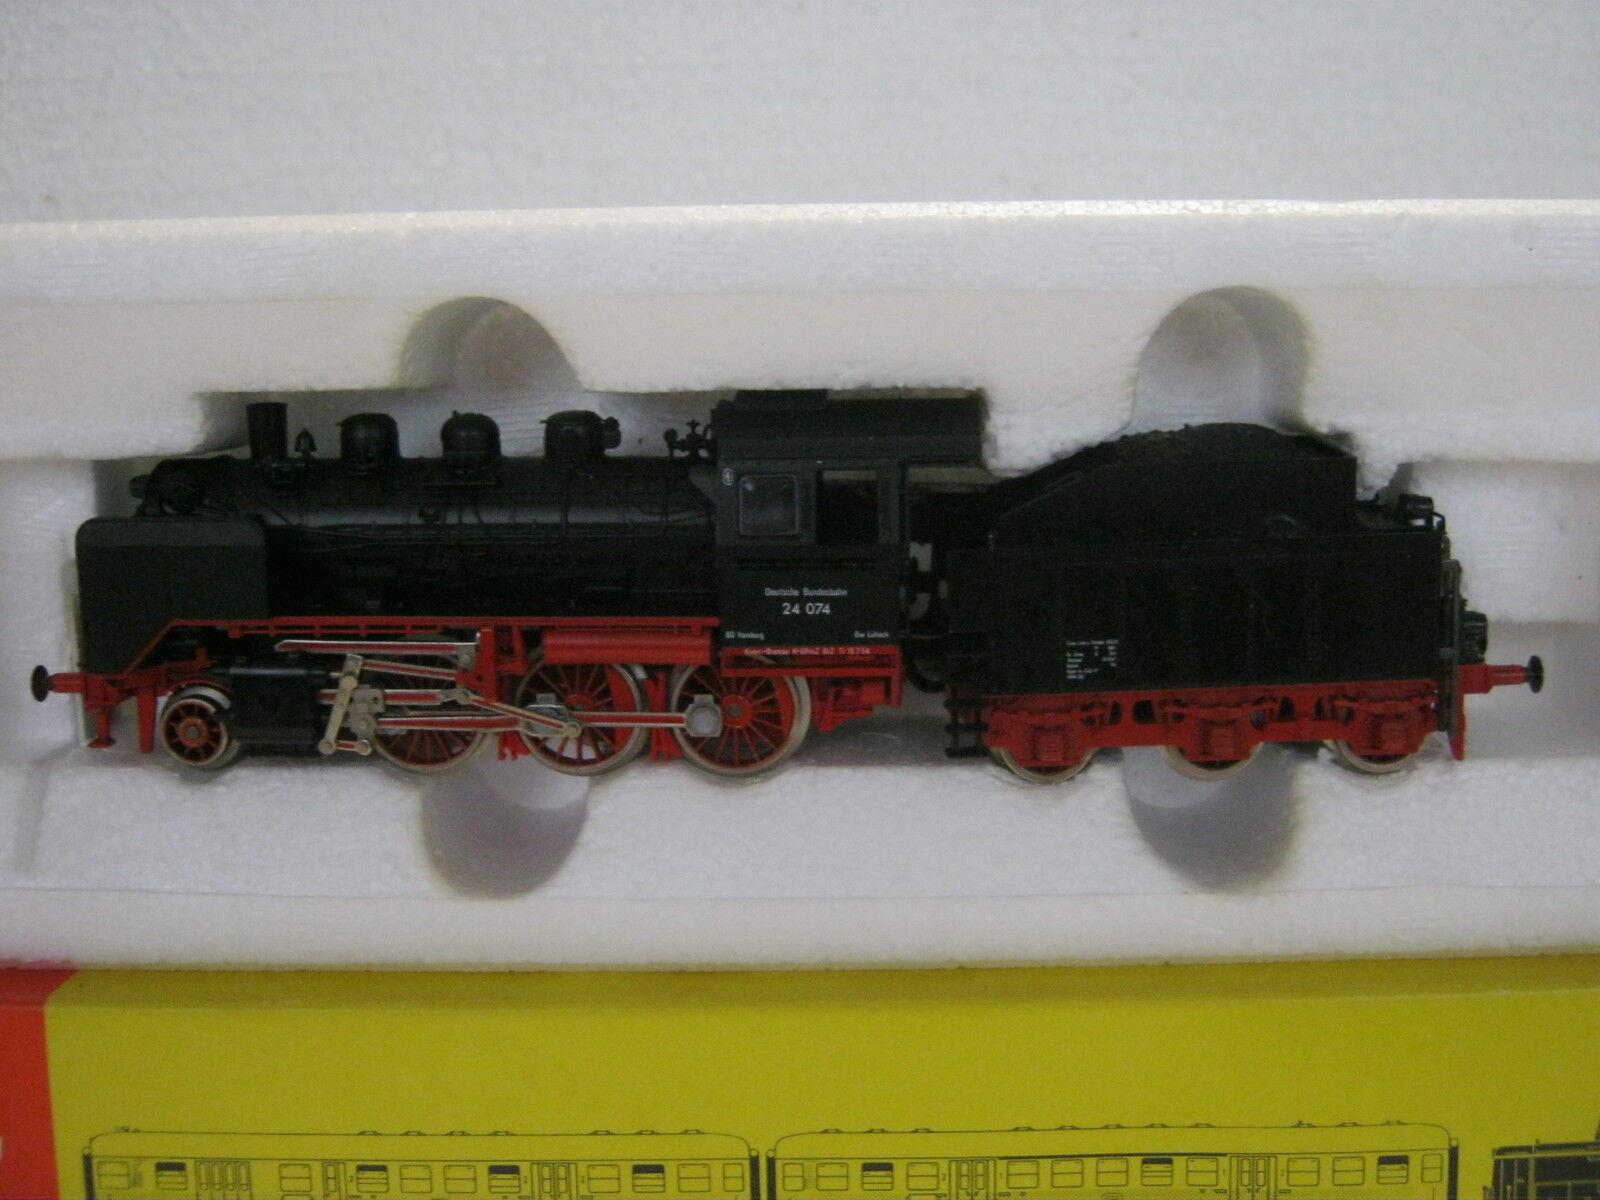 Fleischmann HO 4140 locomotiva a vapore BR 24 074 DB (rg cf 005-45s3 3)